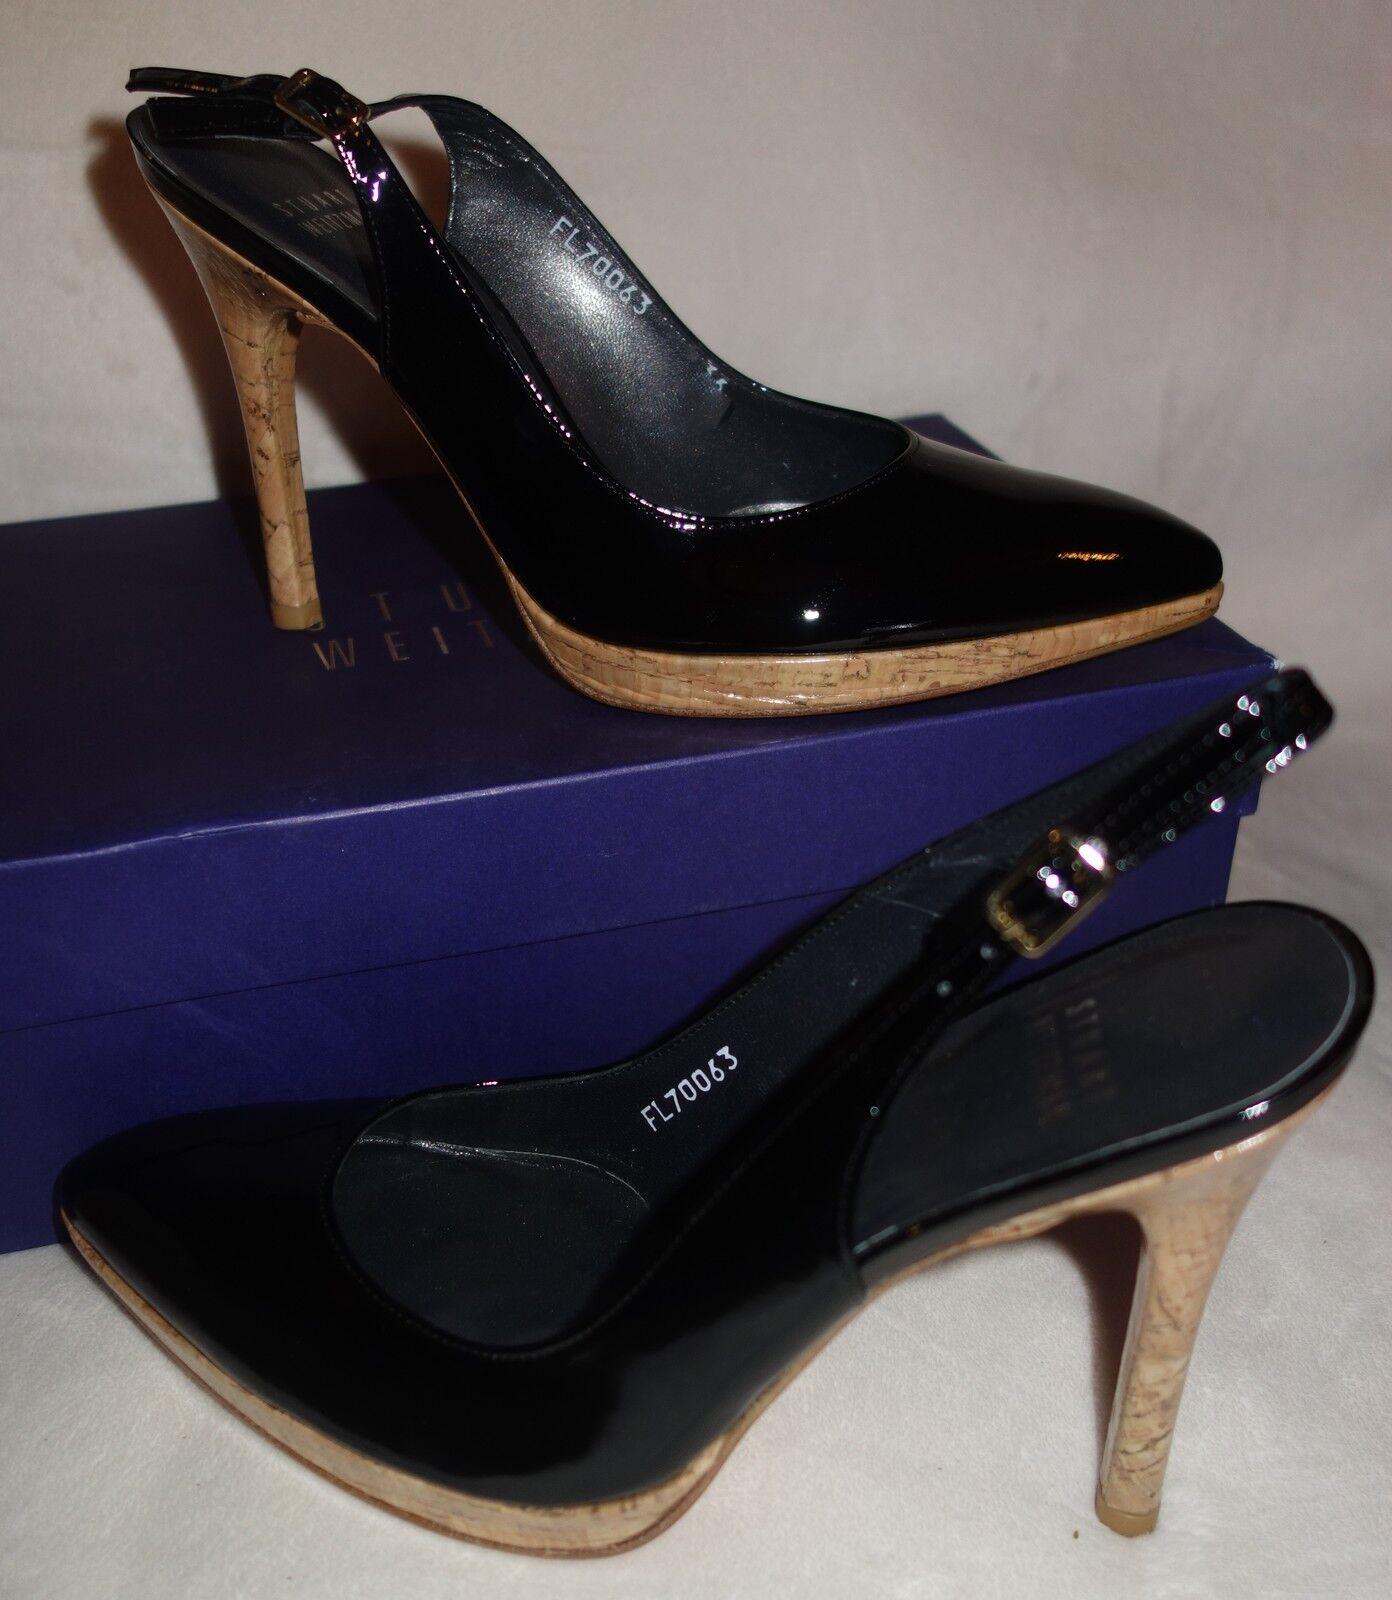 Stuart Weitzman 'Miasling' Genuine Patent Pelle Heels  - sz 37 new